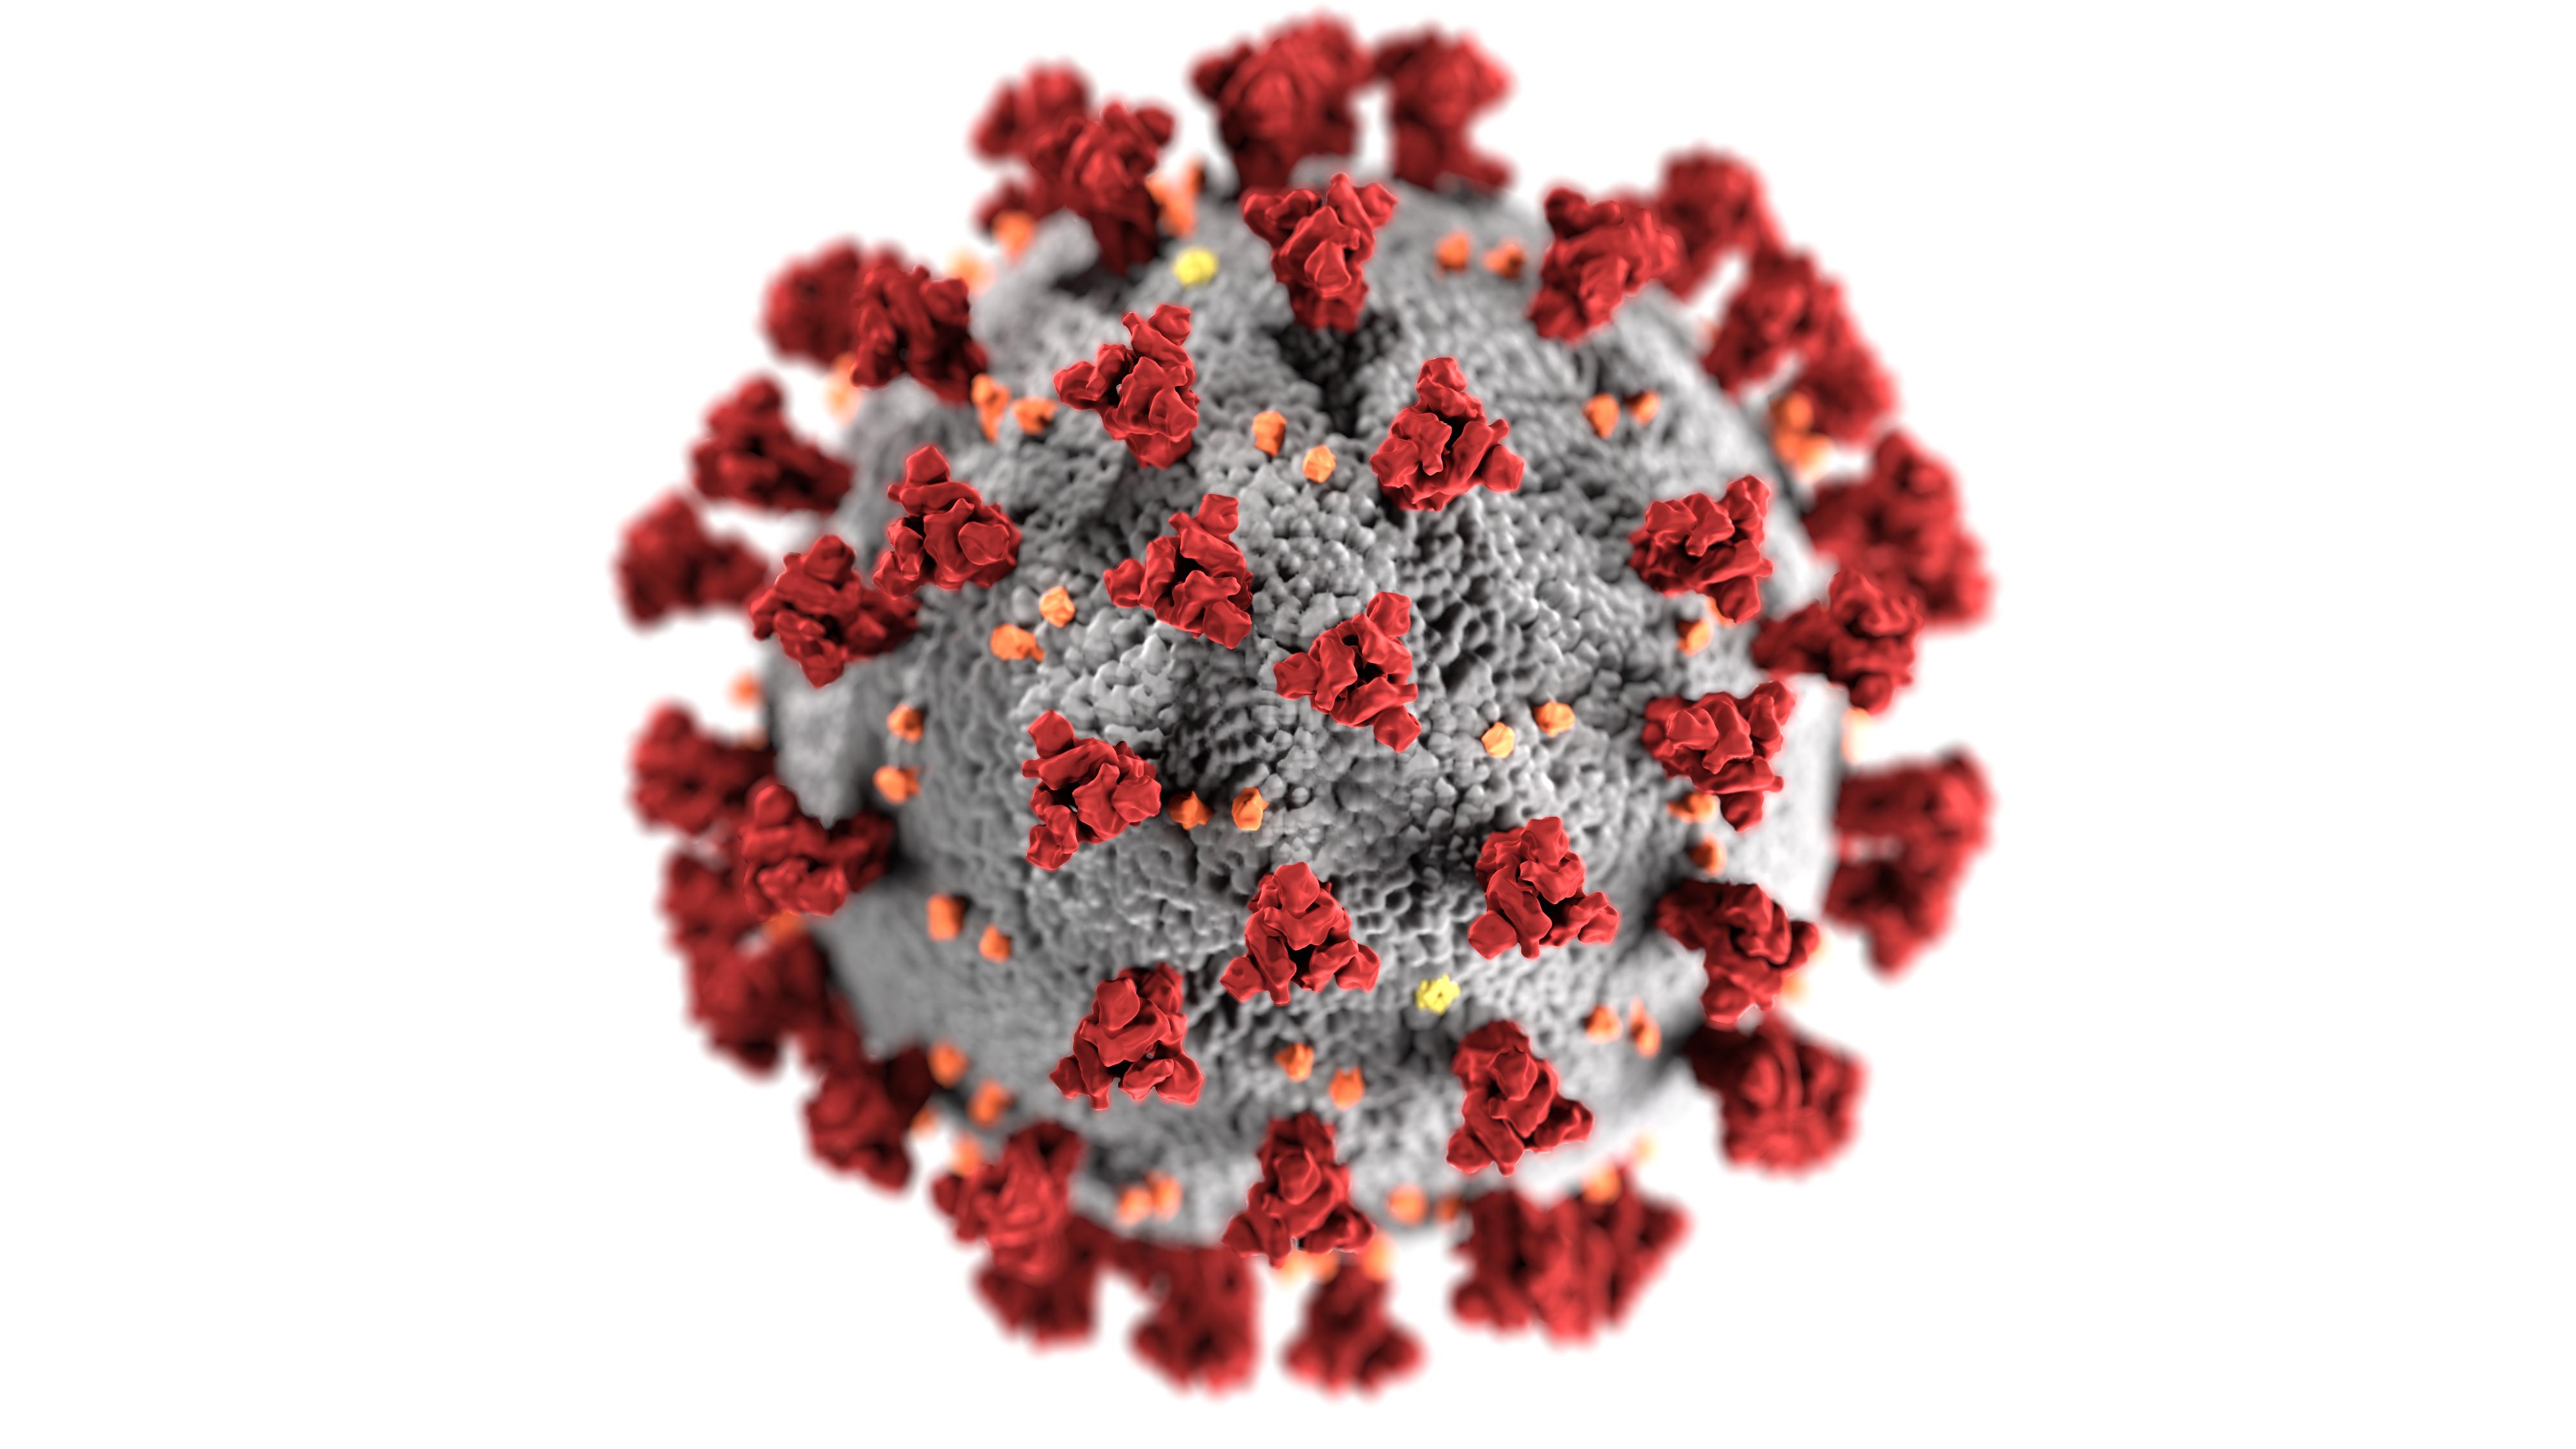 Coronavirus COVID-19